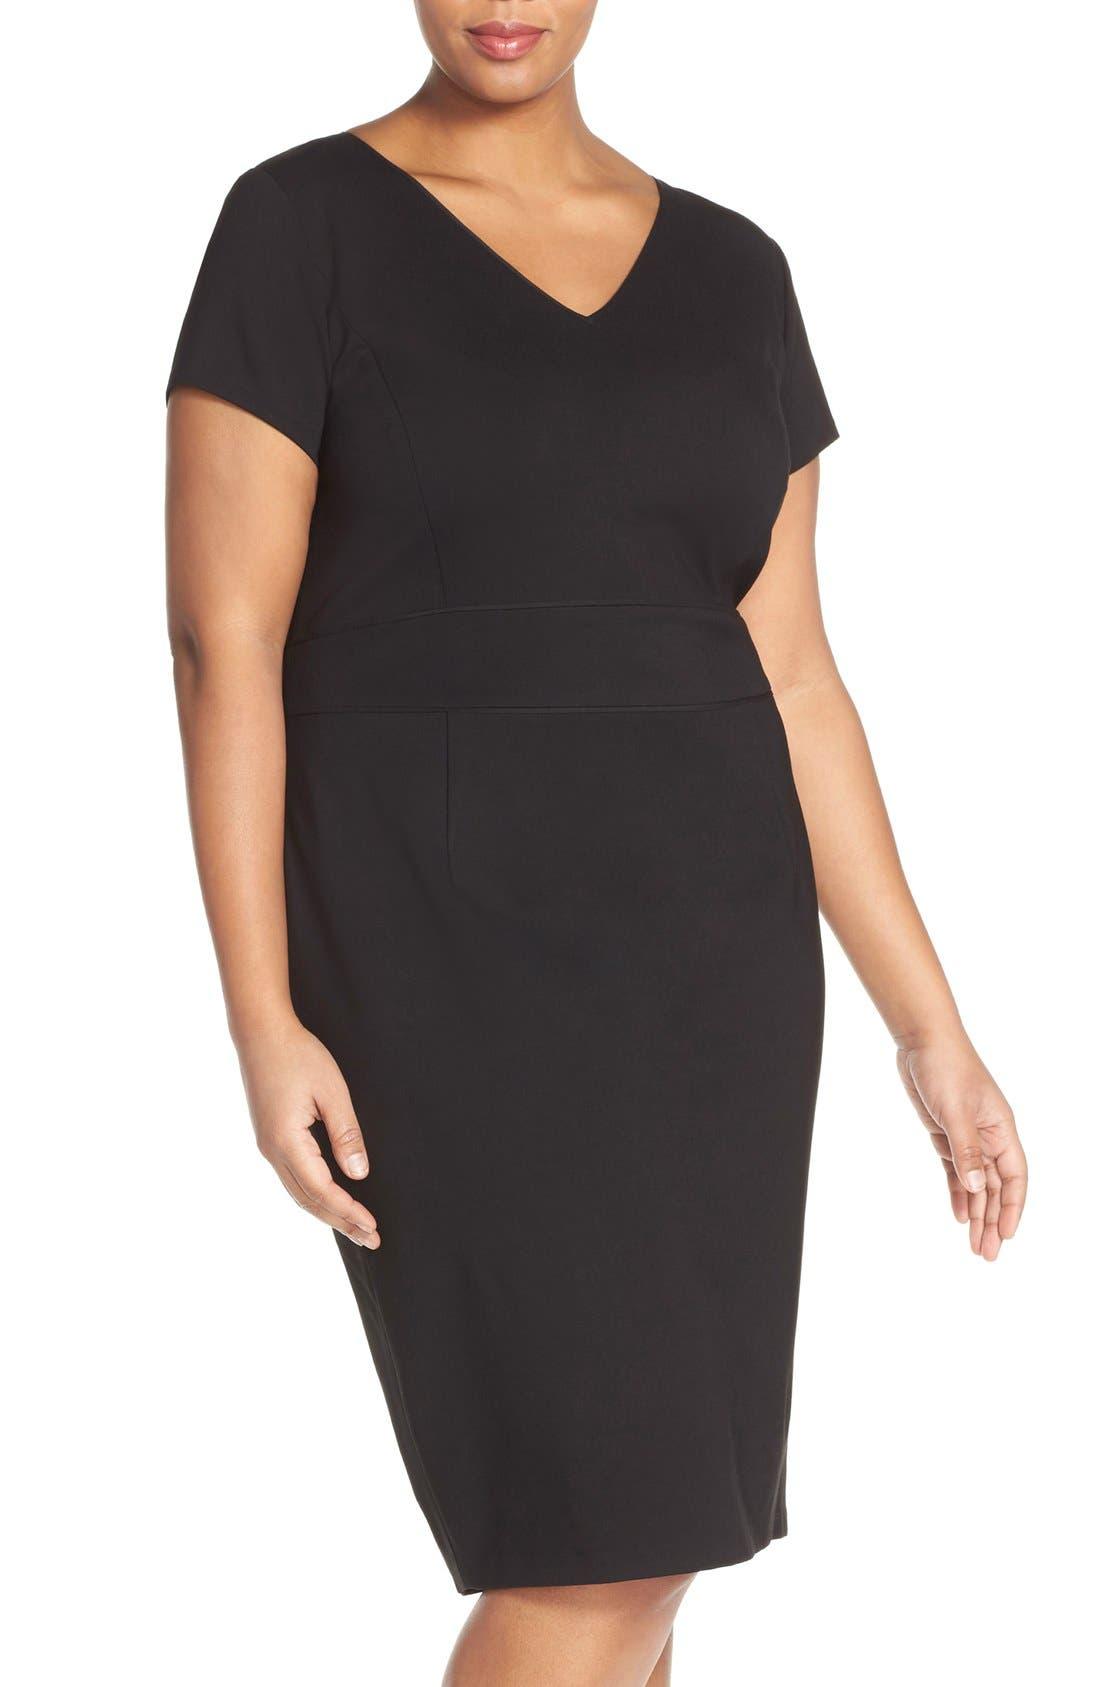 Alternate Image 1 Selected - Sejour Ponte Sheath Dress (Plus Size)